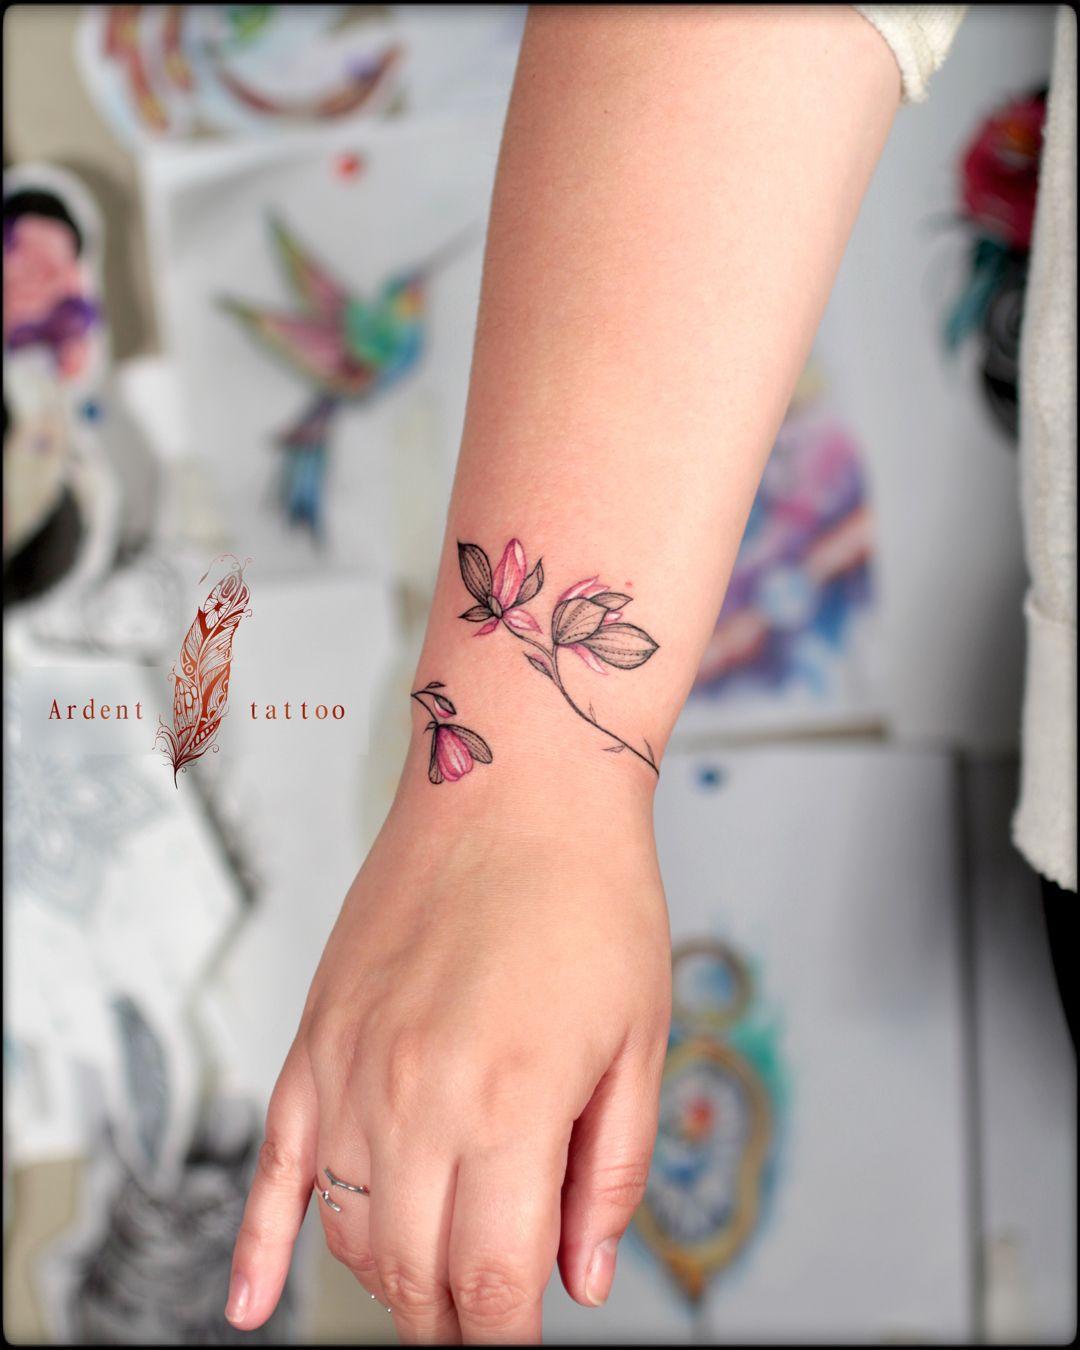 Tattoo For Womens Wrist: Wrist And Bracelet Tattoos For Women & Men